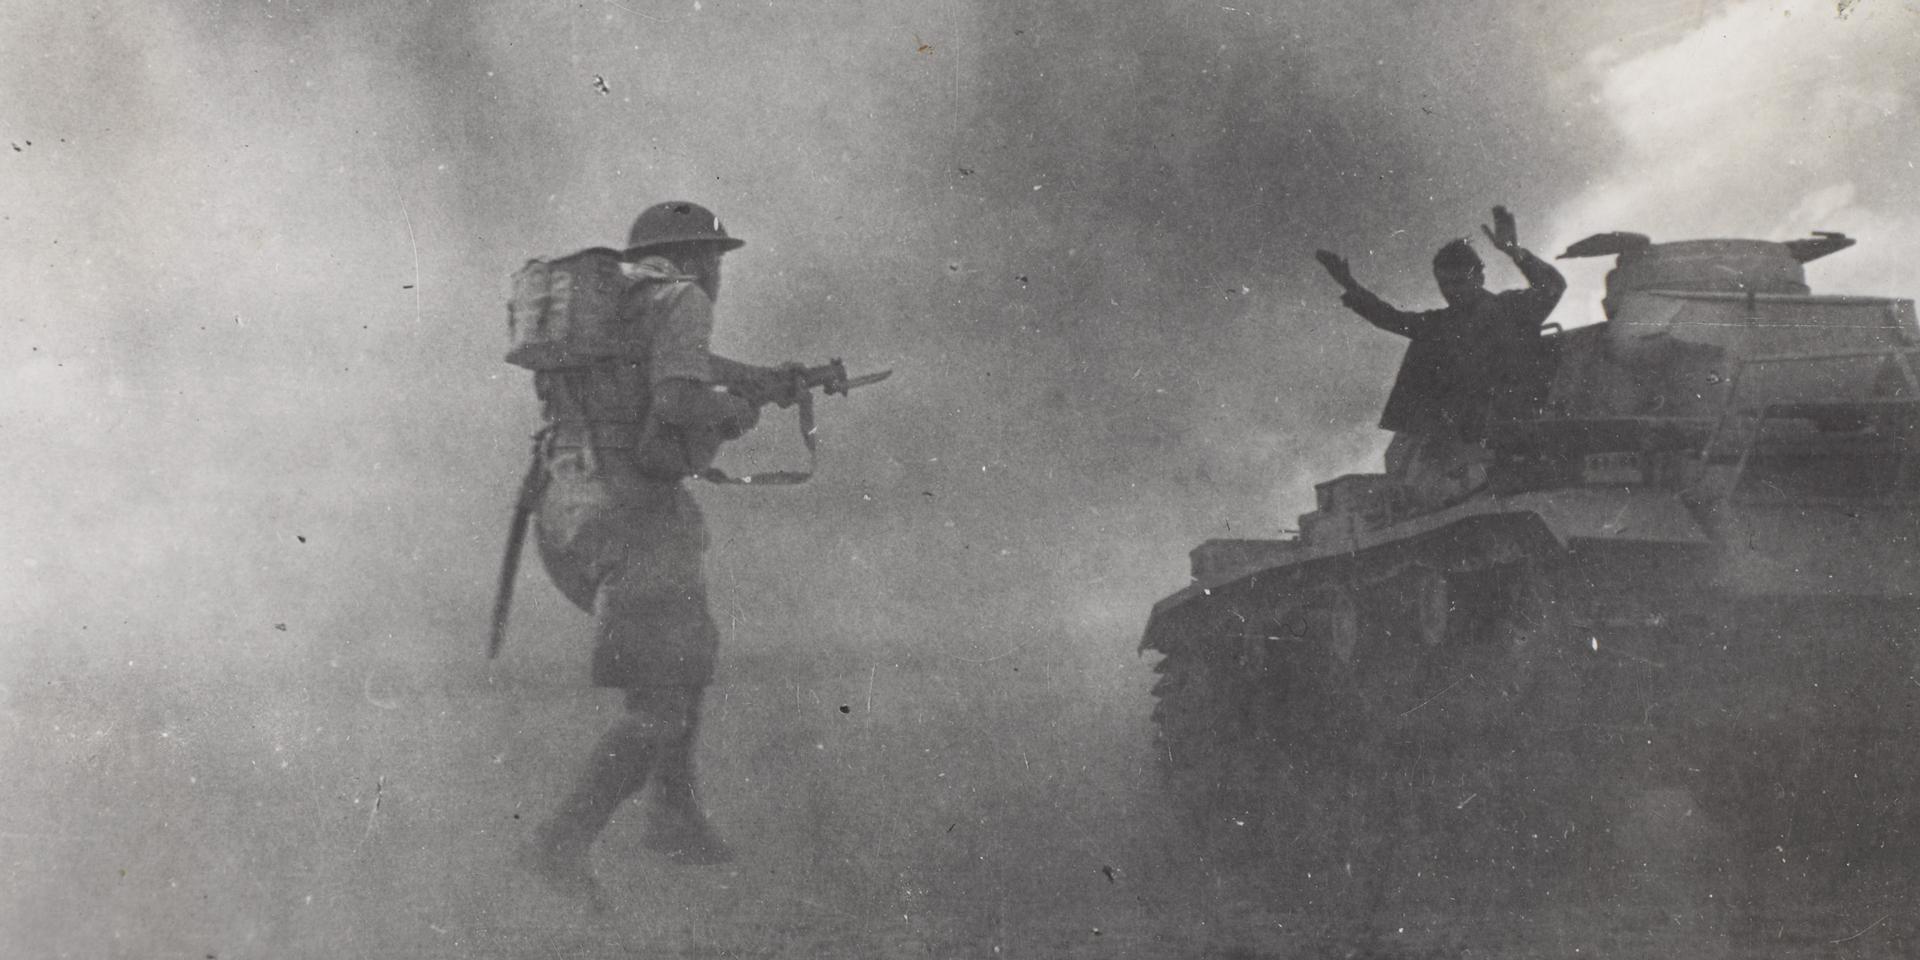   A British infantryman capturing a German tank crewman at El Alamein, 1942  